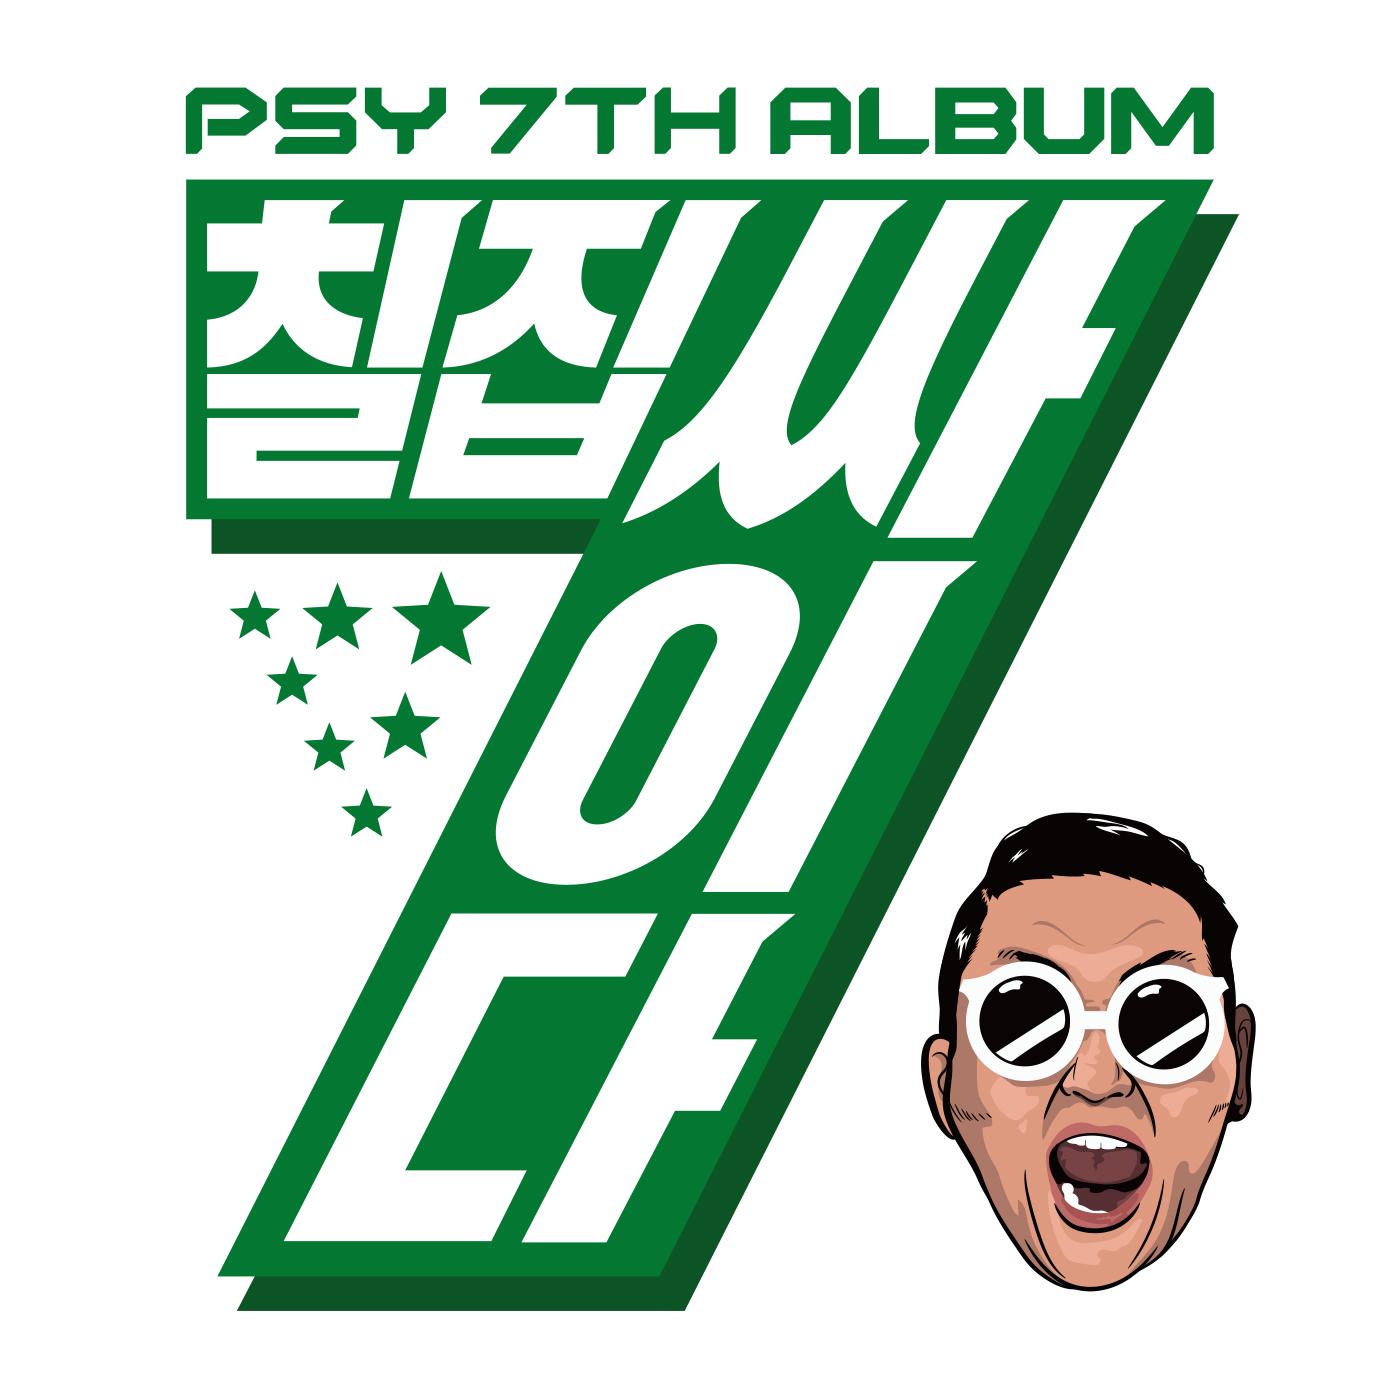 [Album] 칠집싸이다 / PSY 7TH ALBUM - PSY